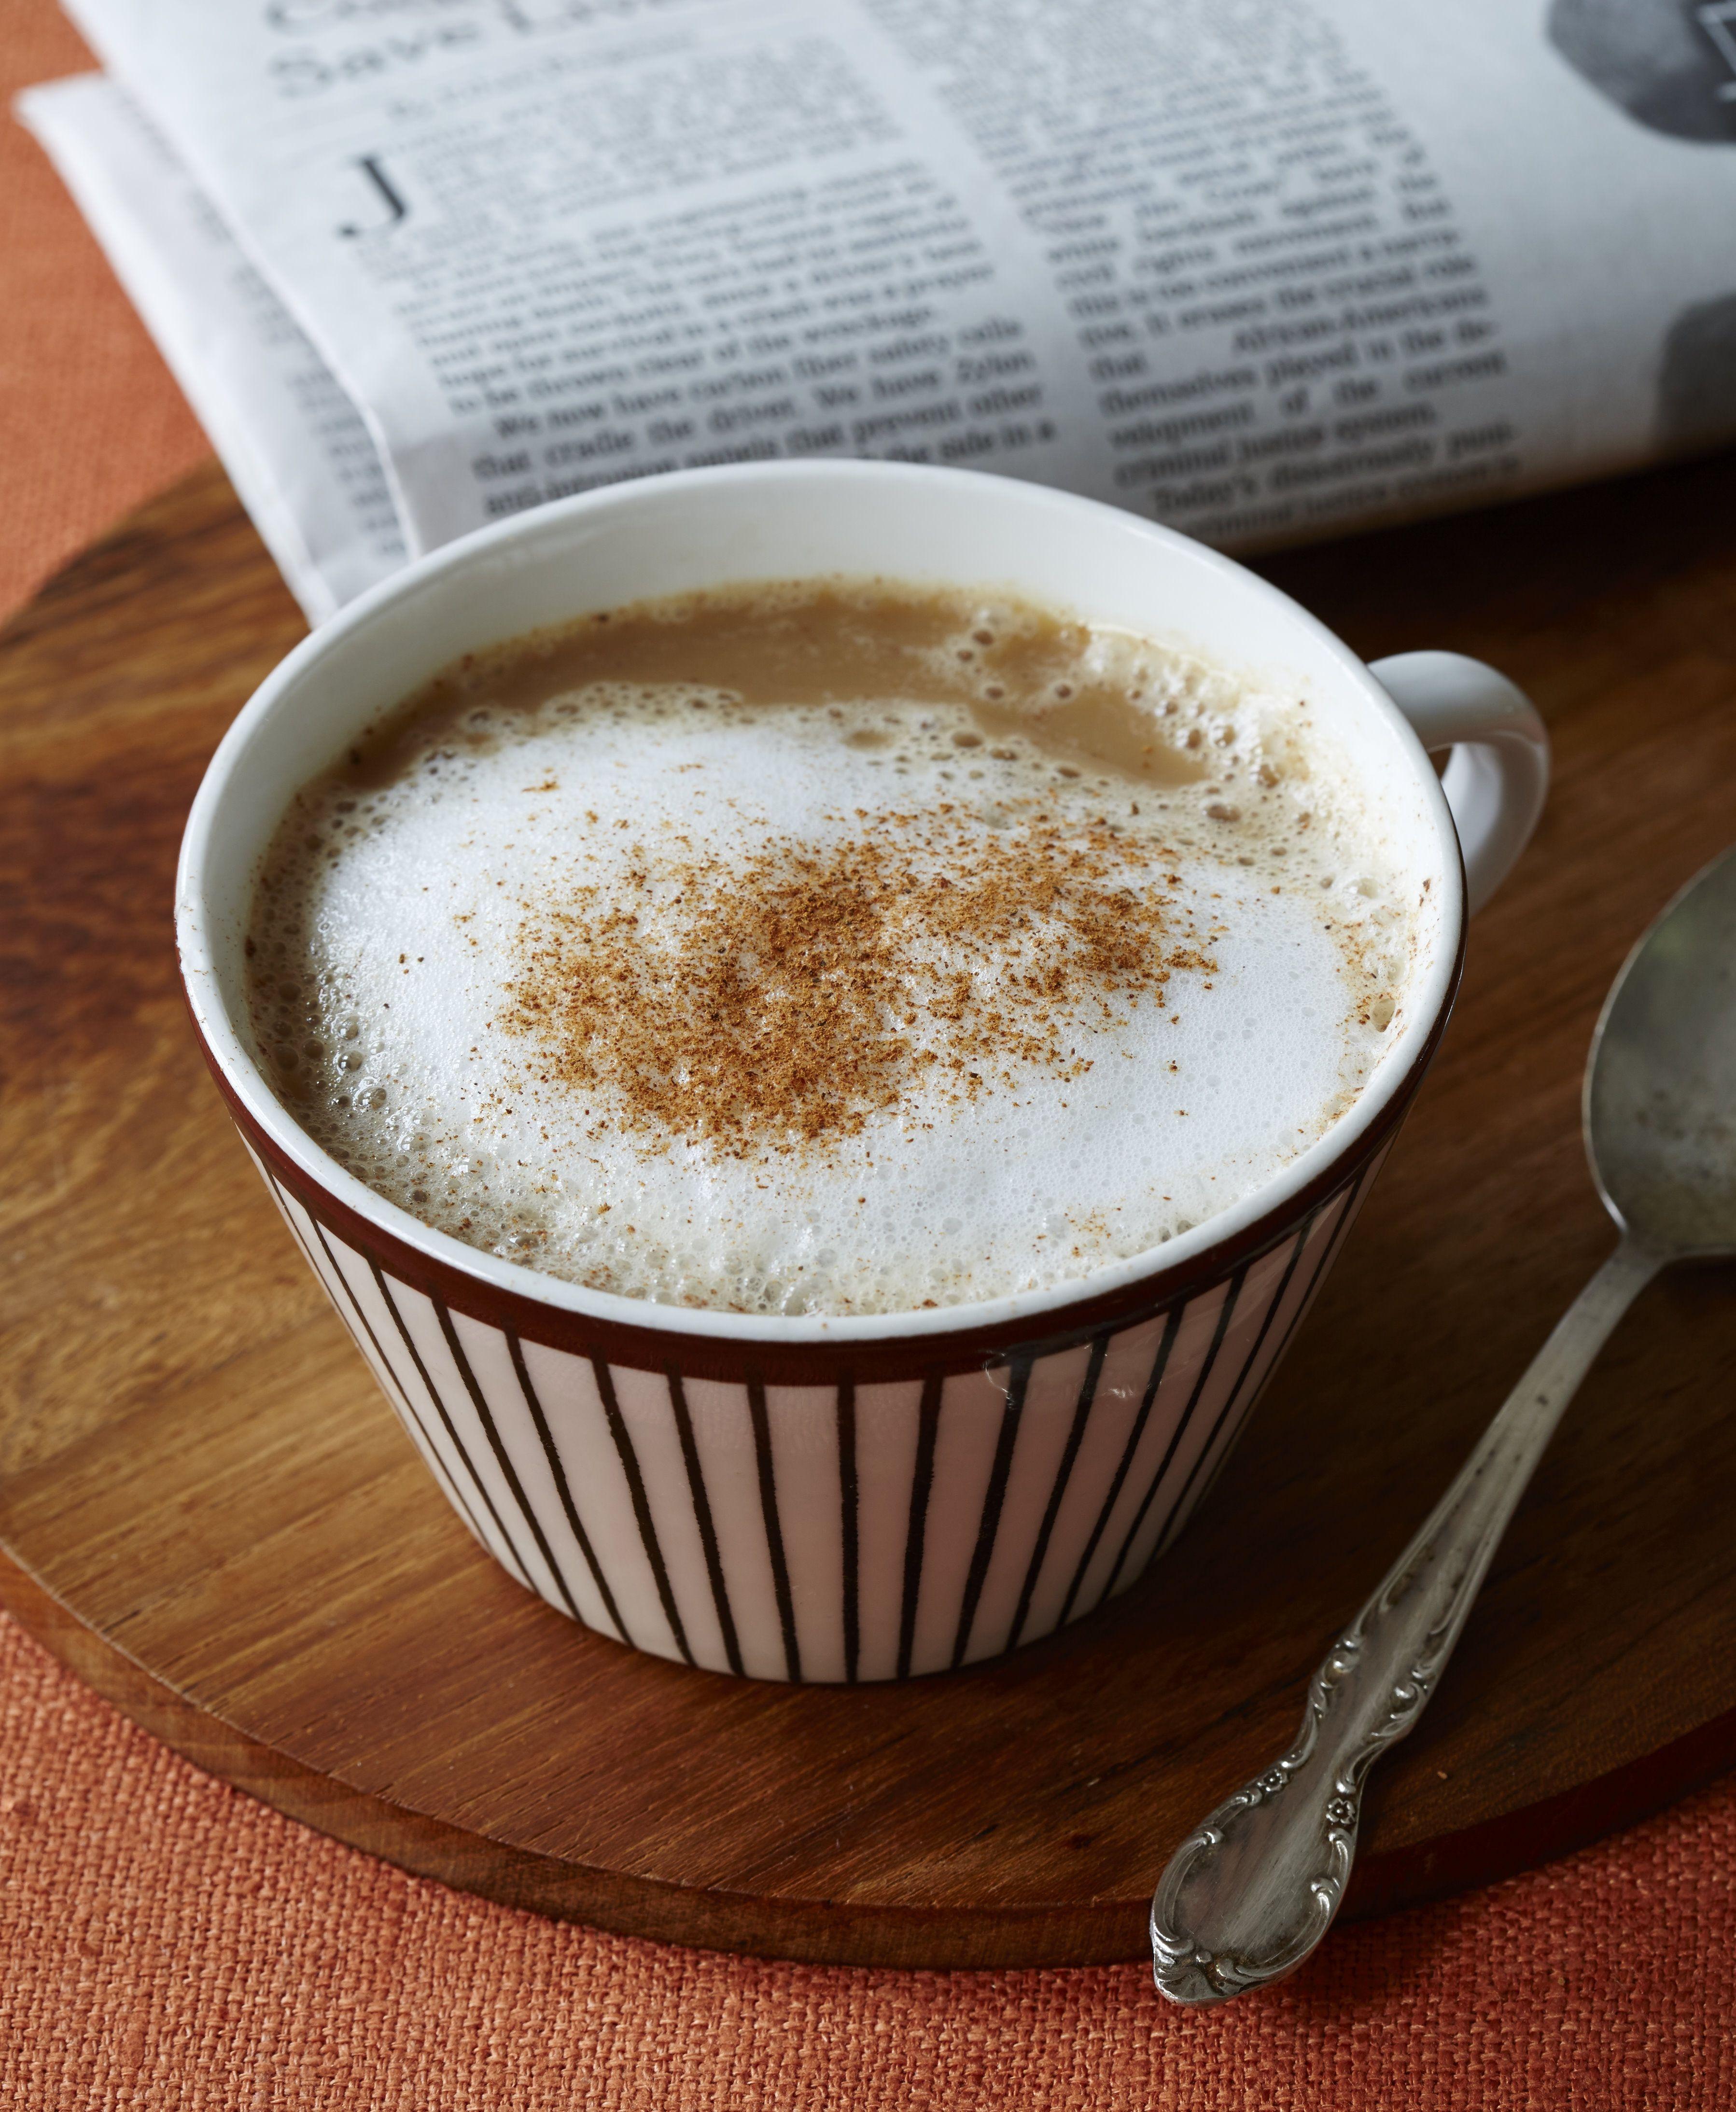 Create Your Own Pumpkin Spice Latte Make your own pumpkin